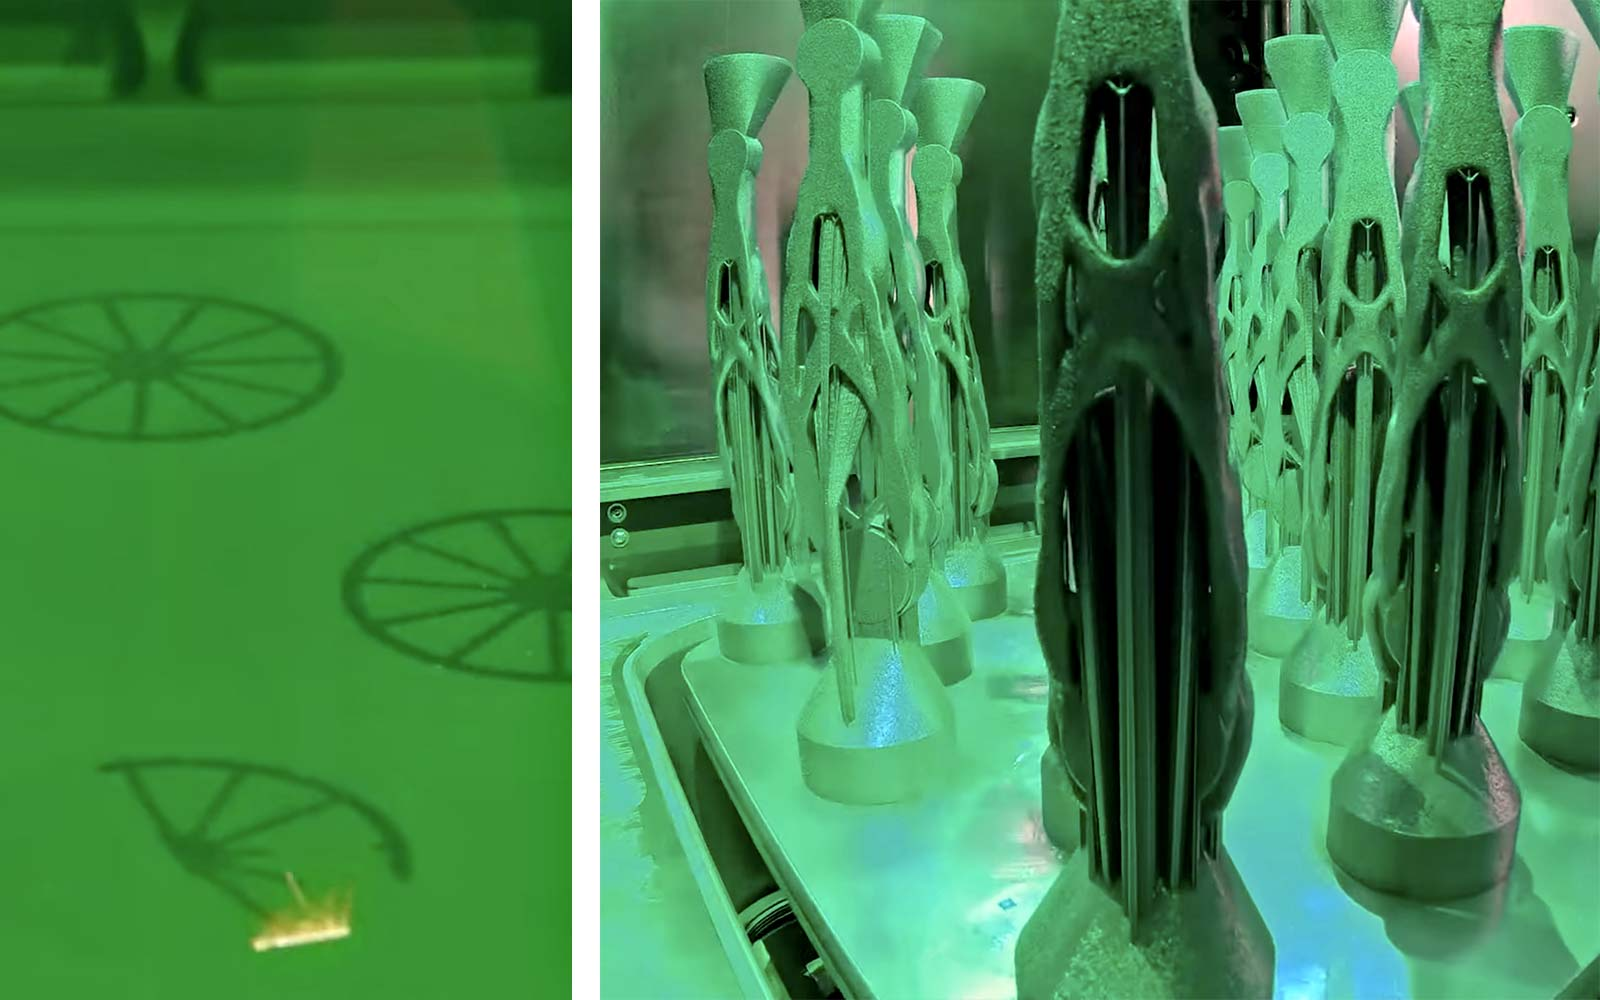 SRAM Autodesk Ai generative design prototype MTB cranks, machine-learning artificial intelligence, additive manufacturing sintered metal